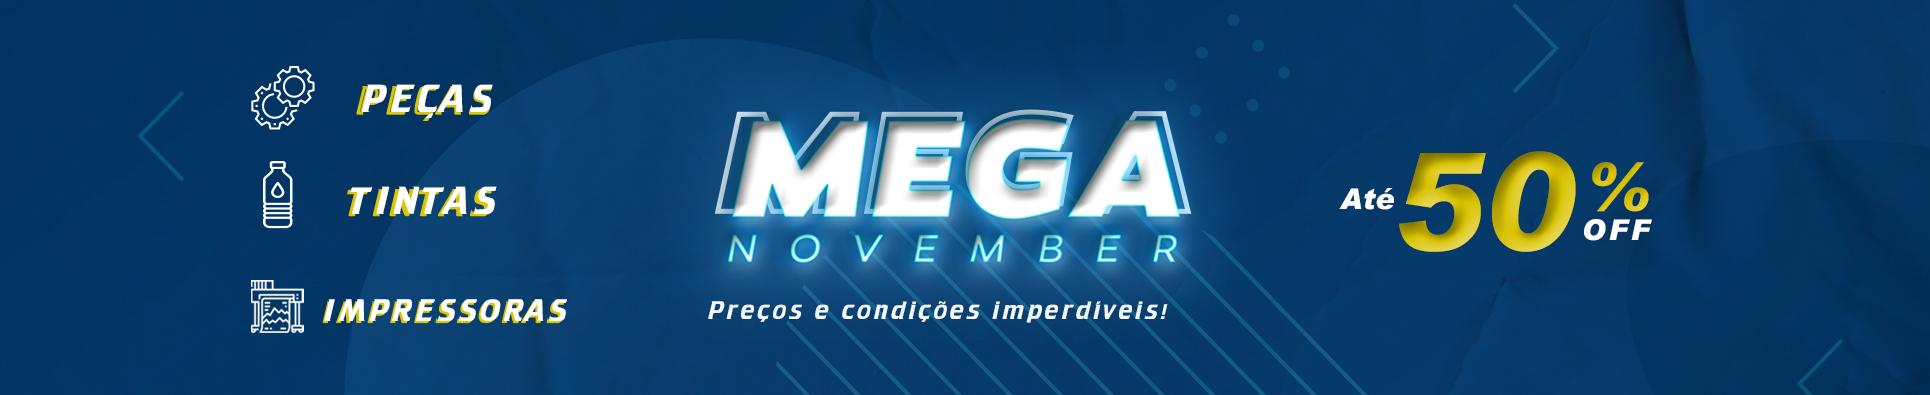 mega november megagraphic